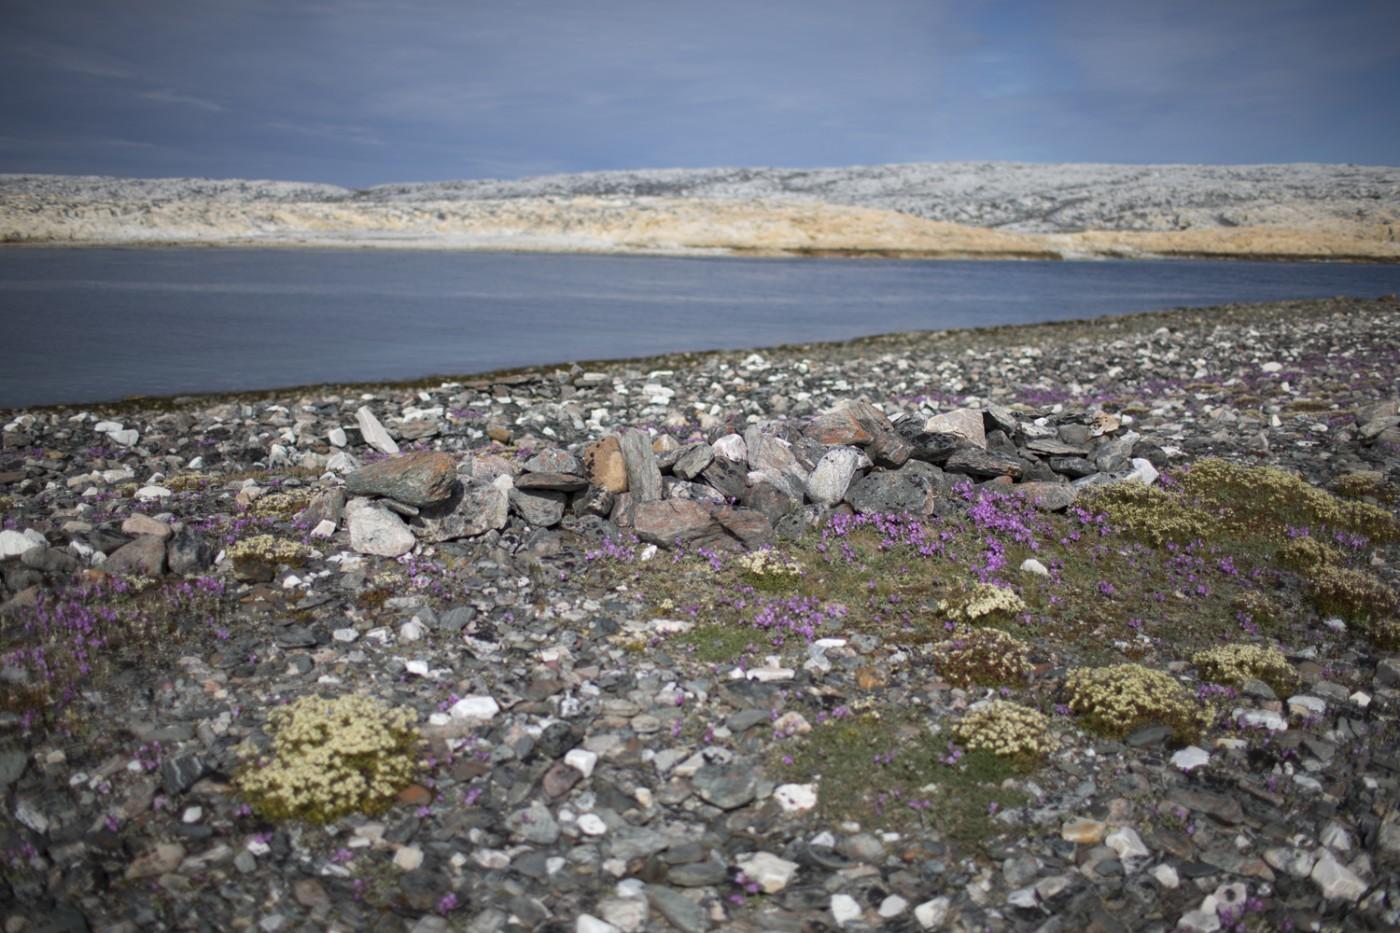 Johan Hallberg-Campbell, </span><span><em>Marble Island, Dead Man's Island, Nunavut</em>, </span><span>2014. Courtesy of the artist.